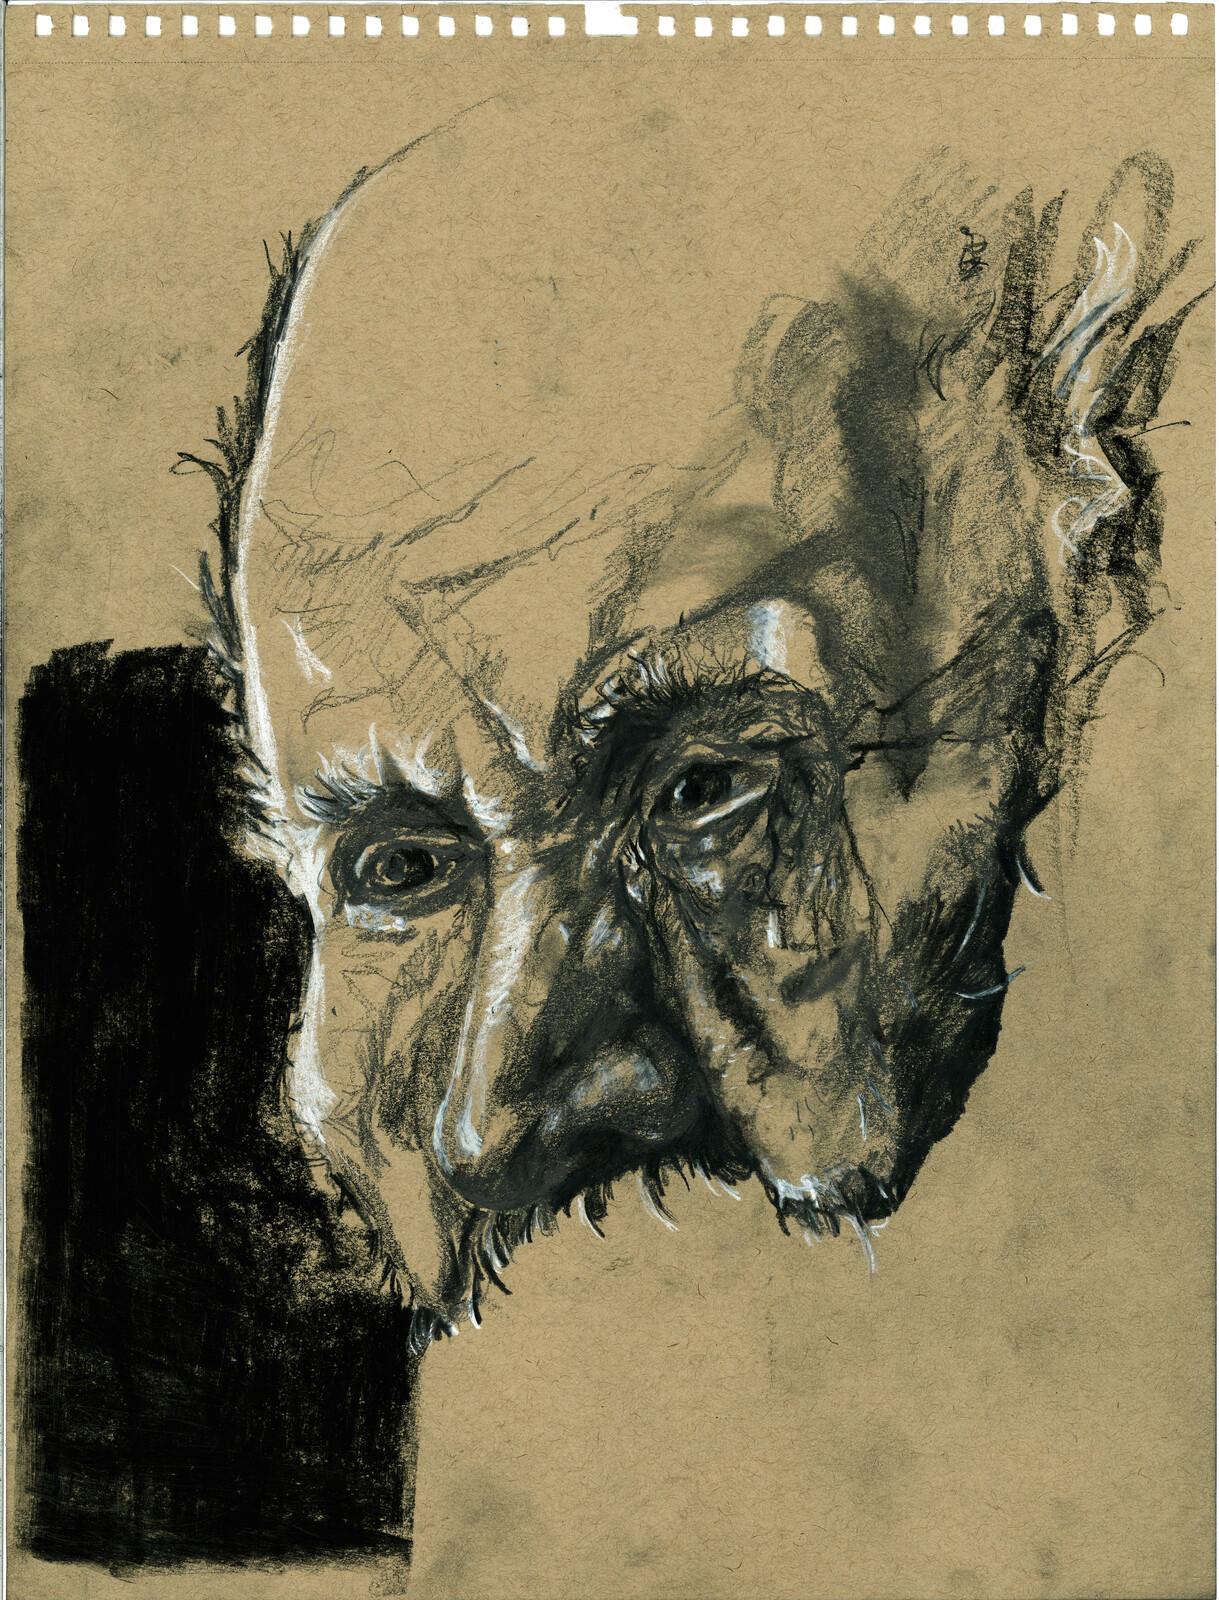 Pensive Hybrid Sketch